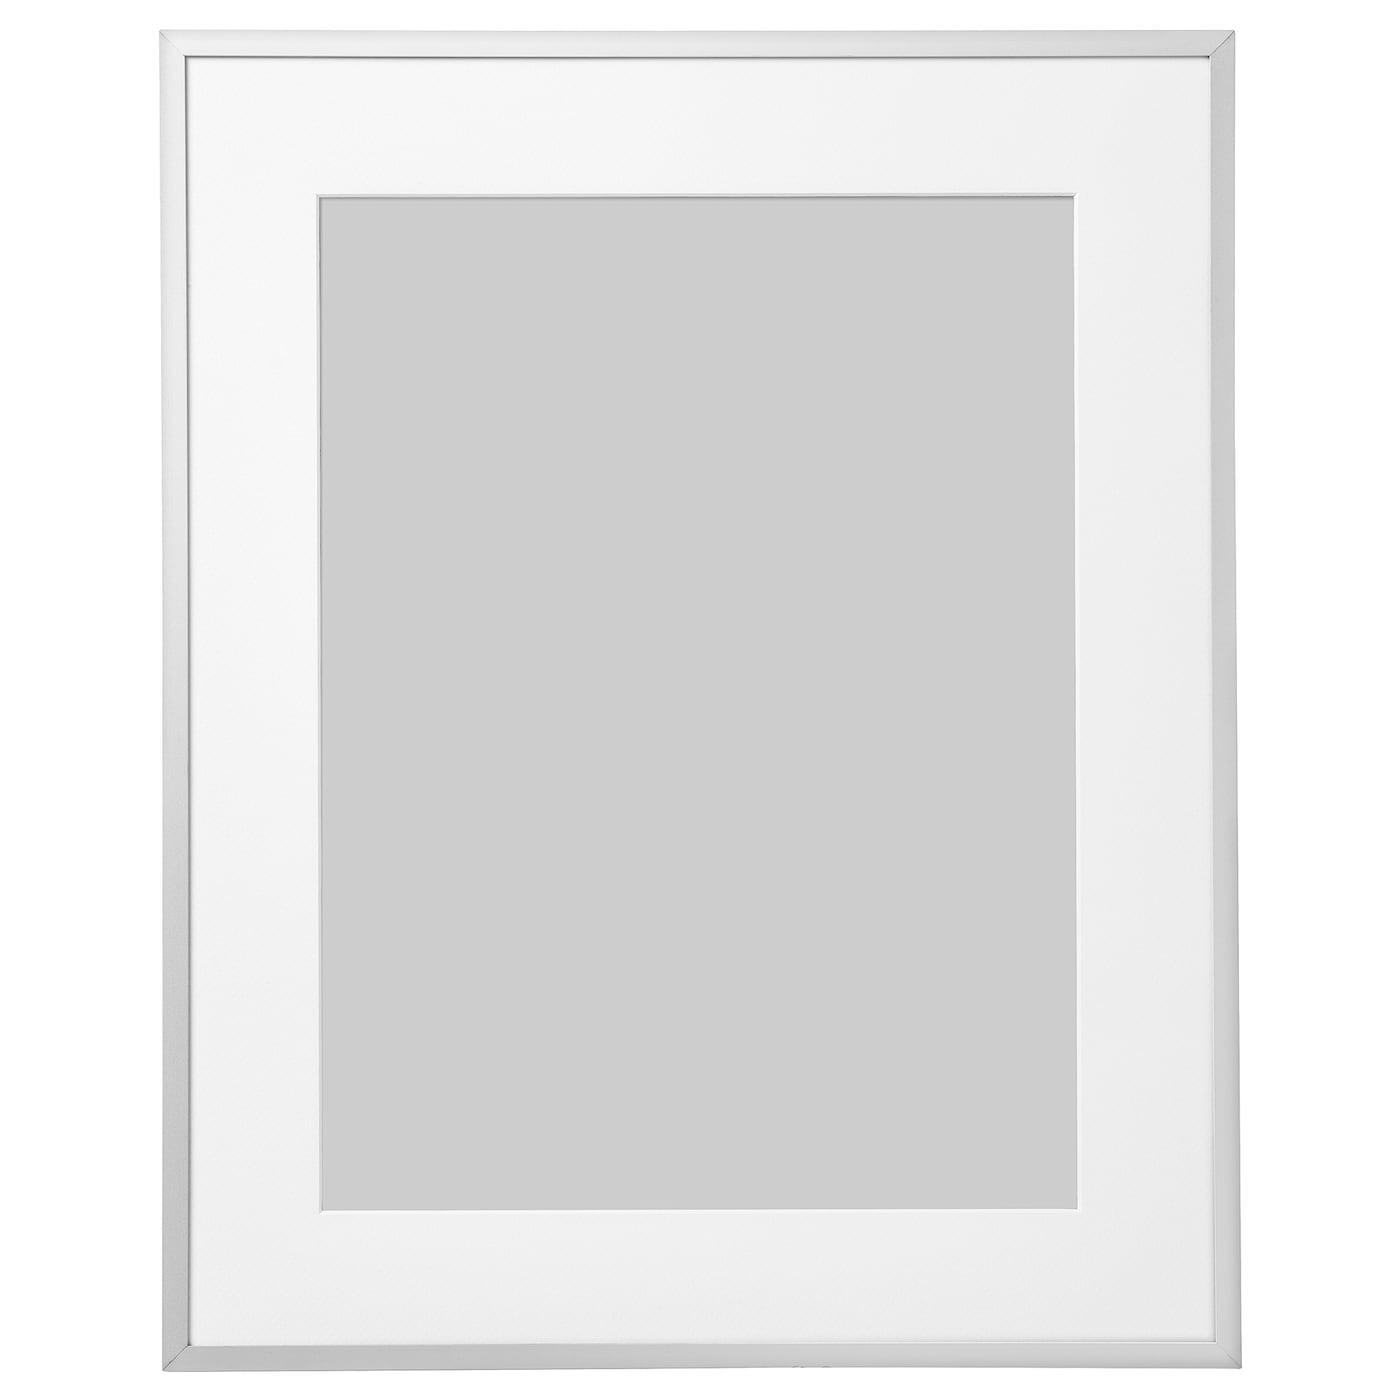 12x24 Plastic Poster Frames | www.topsimages.com